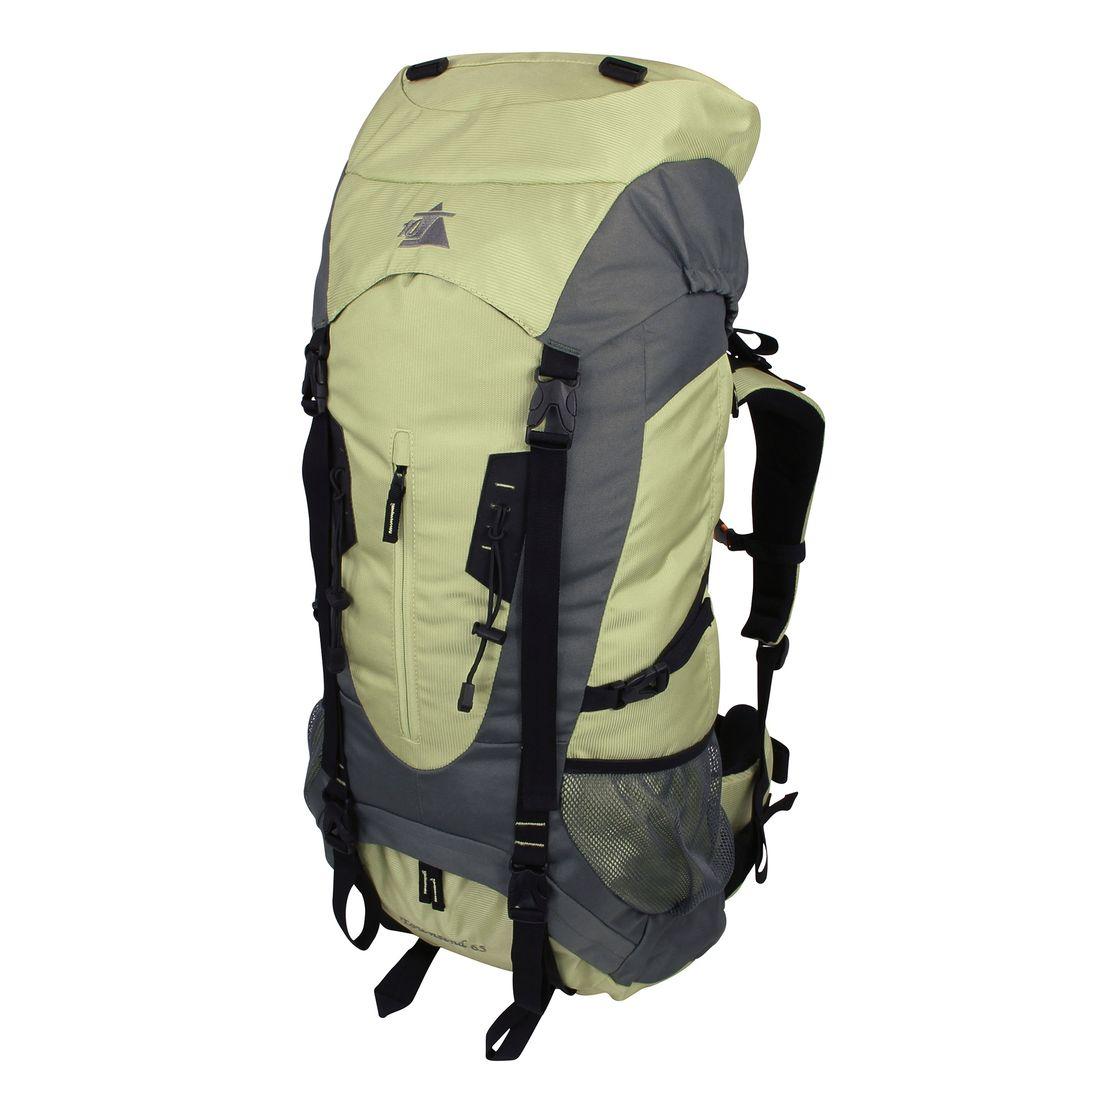 66cec34dc104f4 10T Outdoor Equipment - Townsend 65 - Bild 1